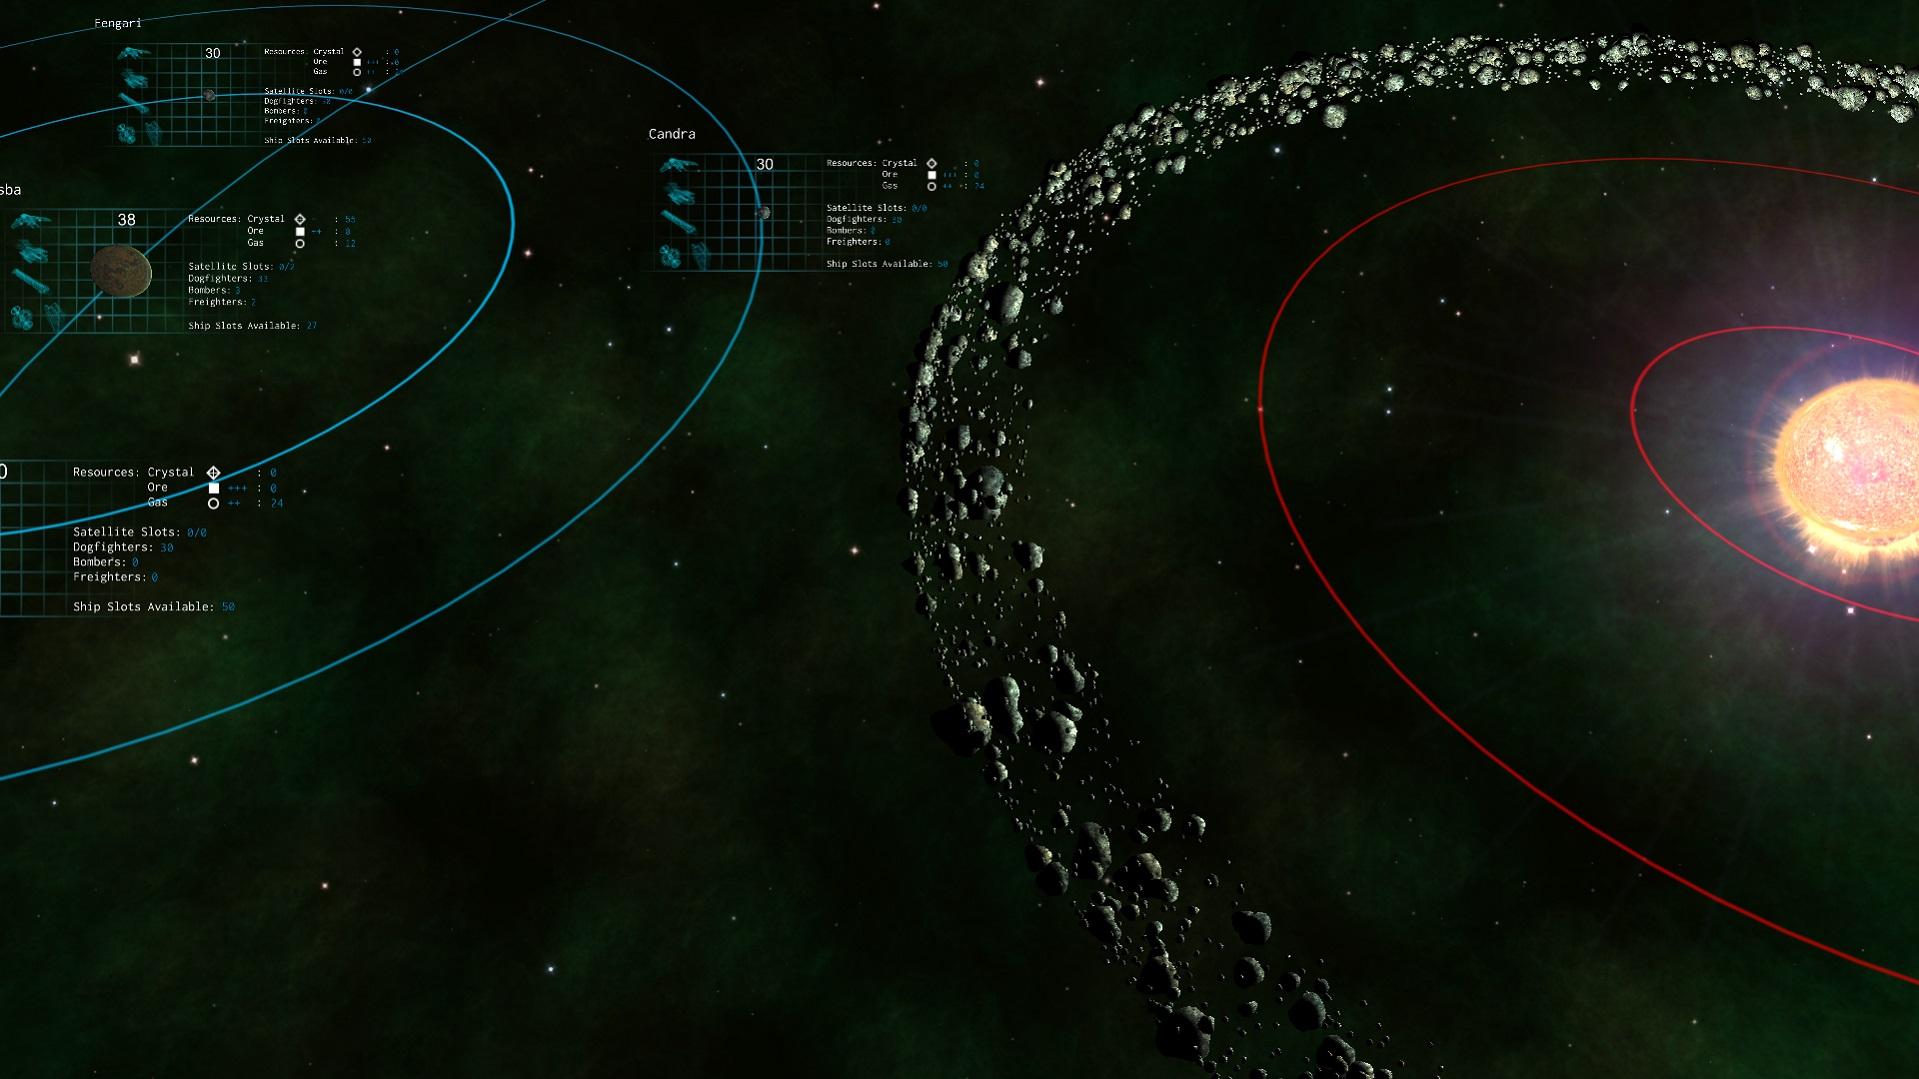 Ologon: Edlen's Wrath